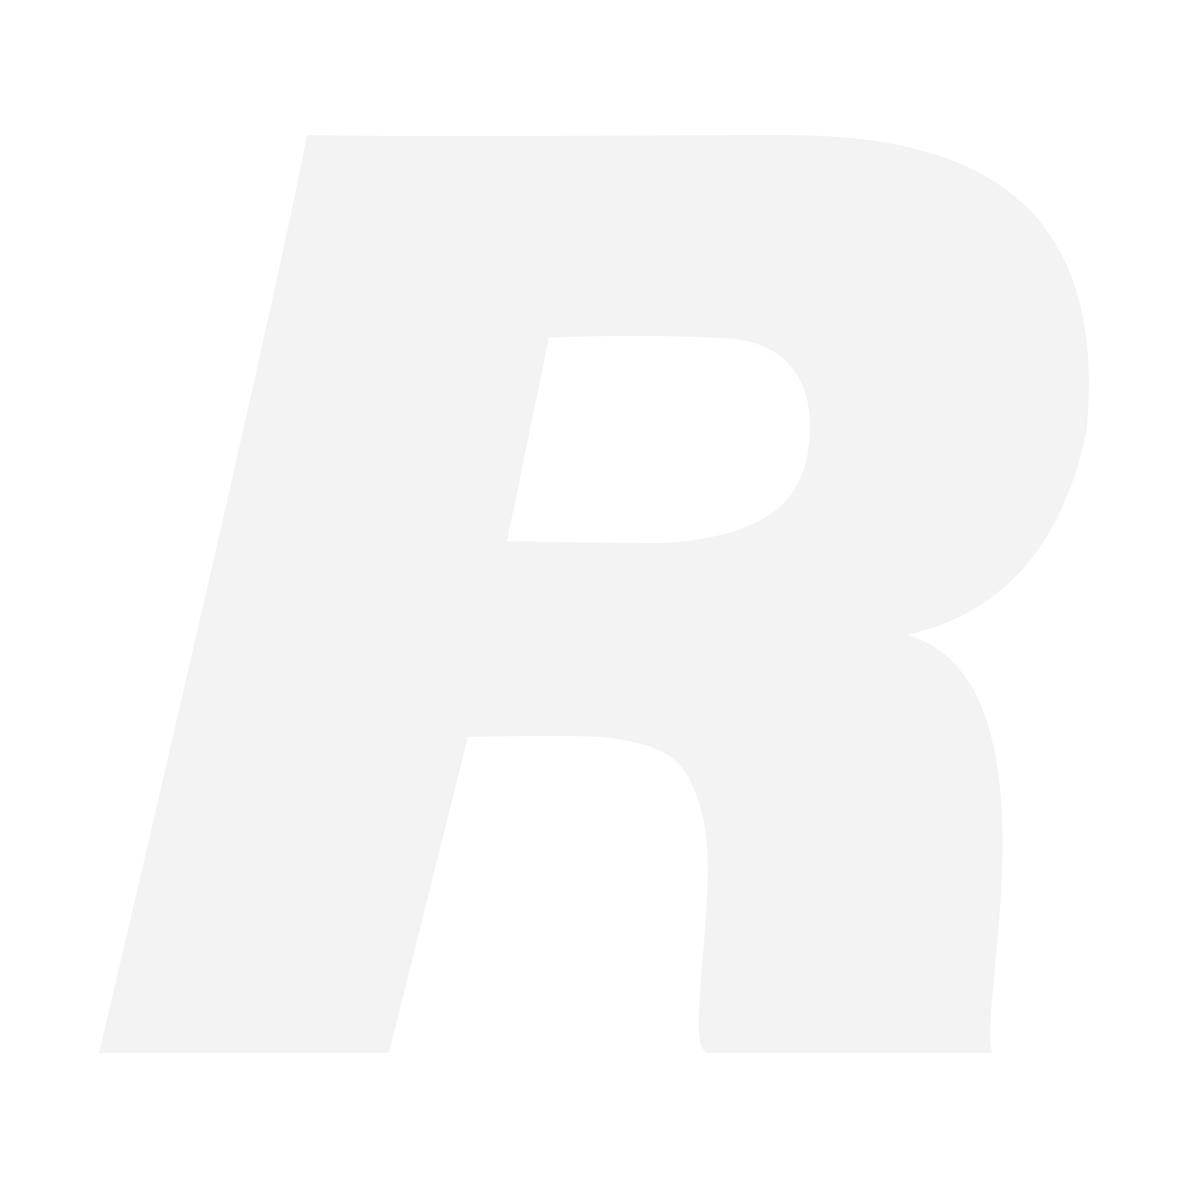 FUJIFILM X-T20 (Sis. Alv 24%) KÄYTETTY